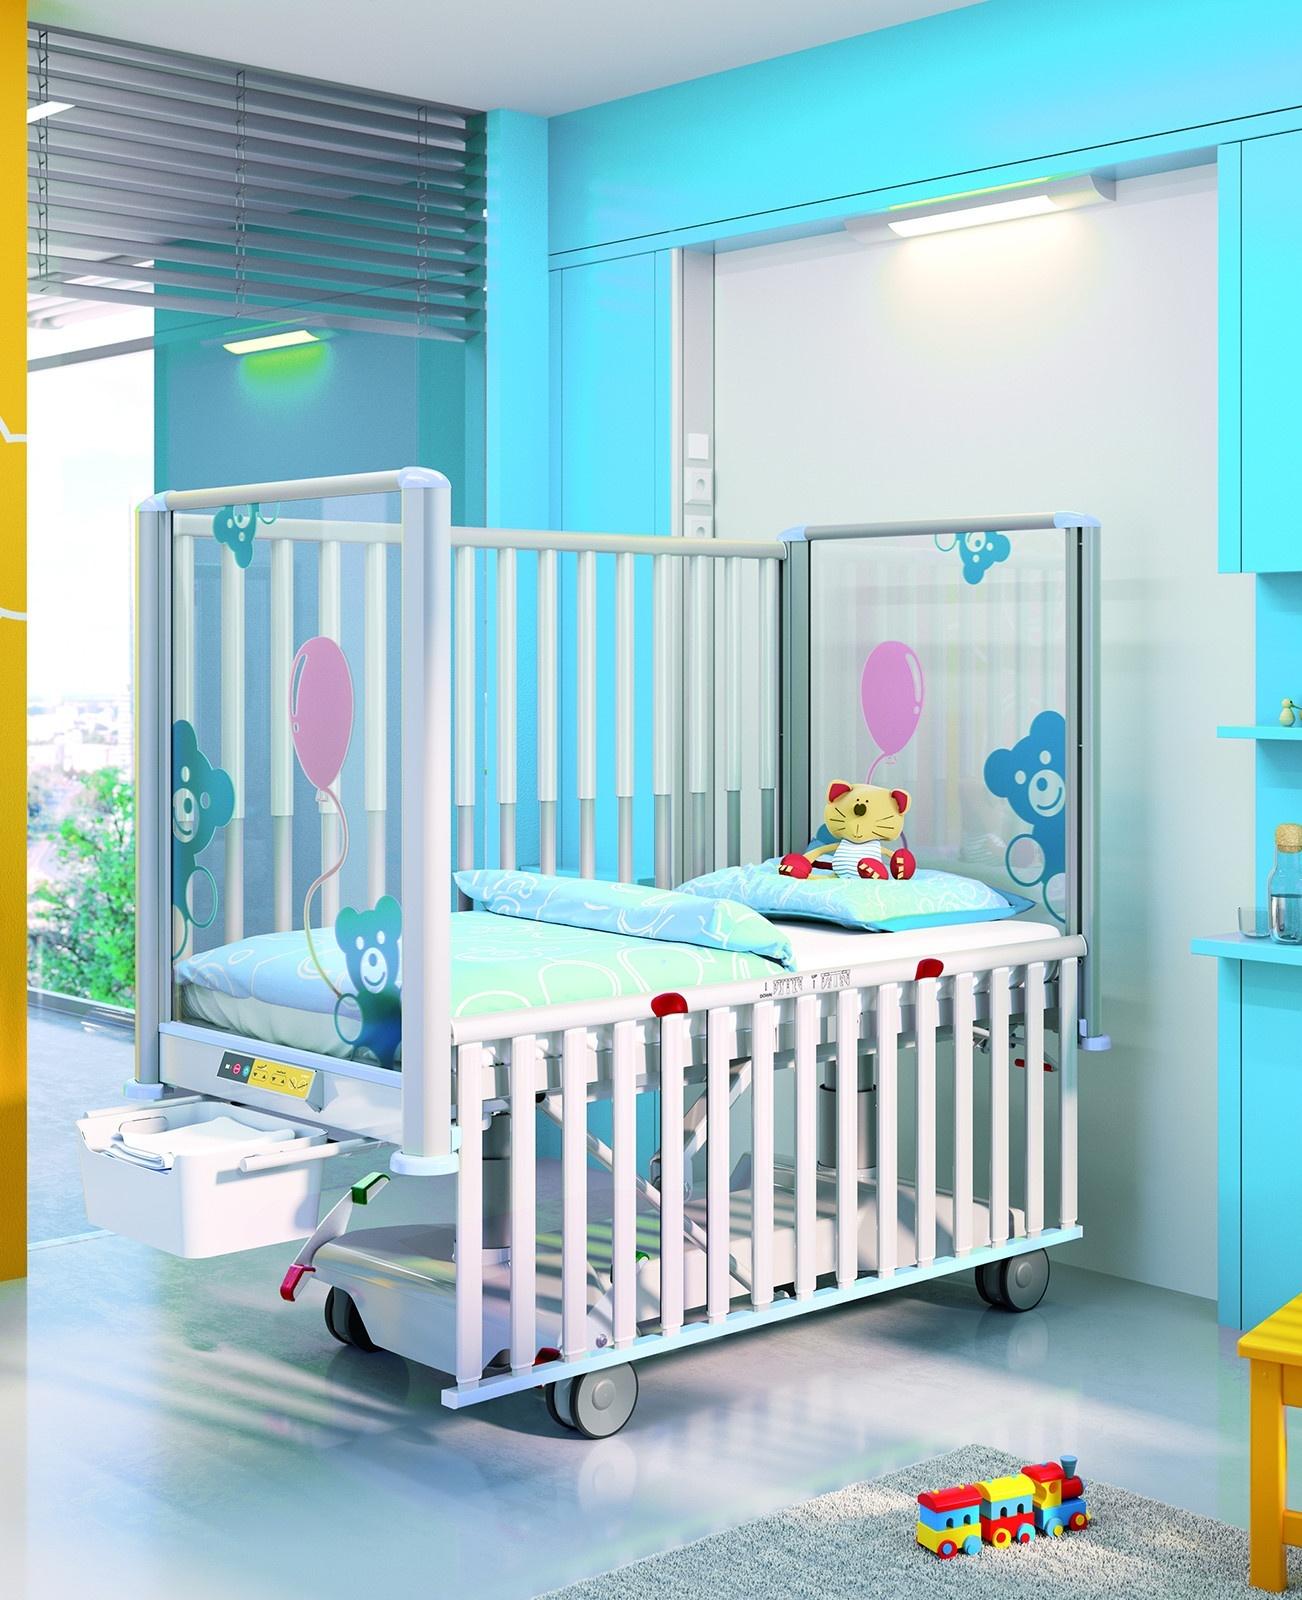 bigla_care_tom2_paediatriebett_spital_3